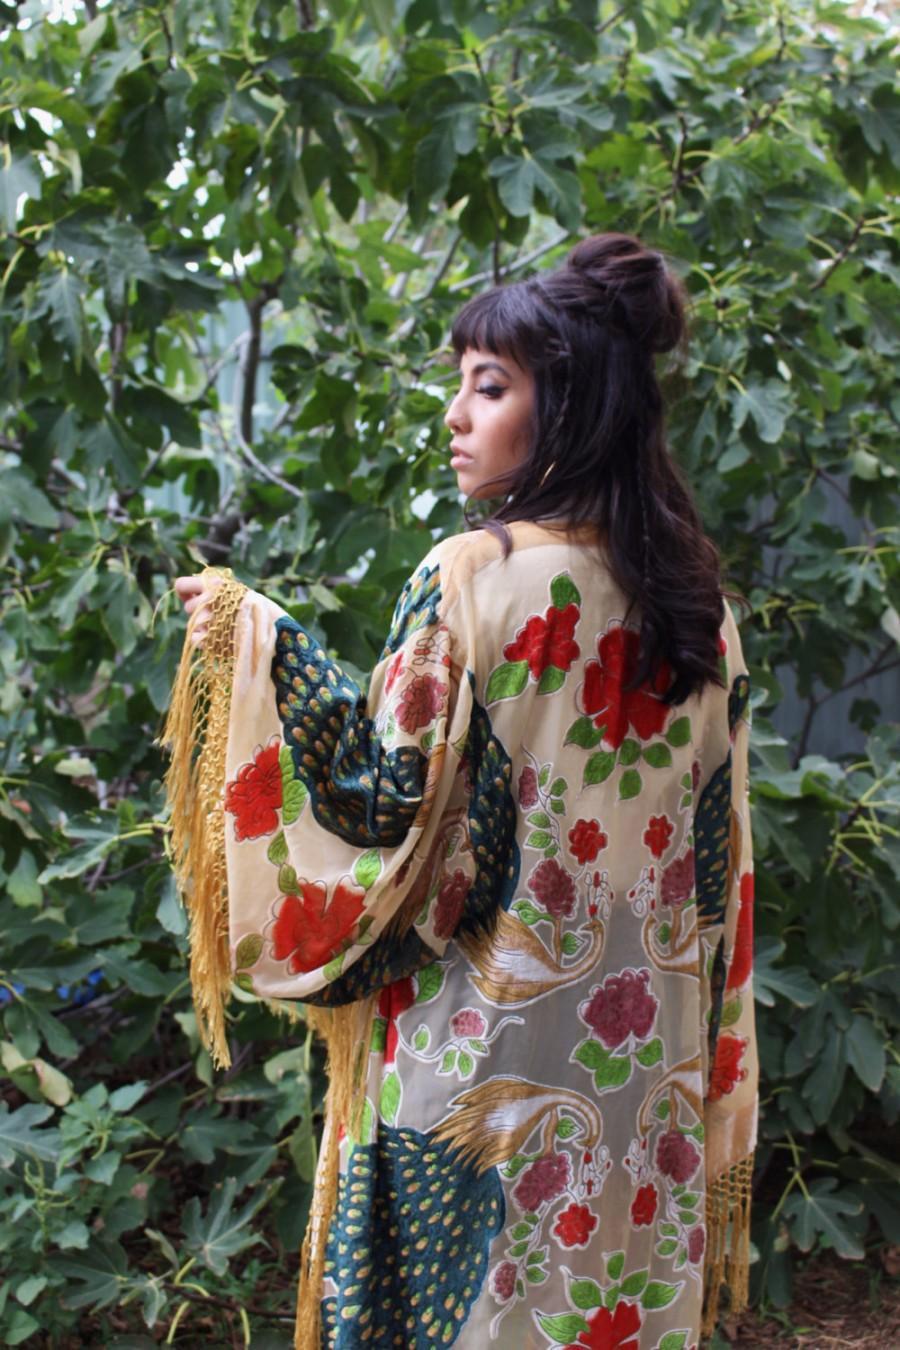 Свадьба - Boho Bridal Velvet Robe - Fringed Bridal Robe - Silk Bridesmaid Kimono Robe - Fringe Boho Brides Robe - Velvet Kimono - Gypsy Bridal Kimono